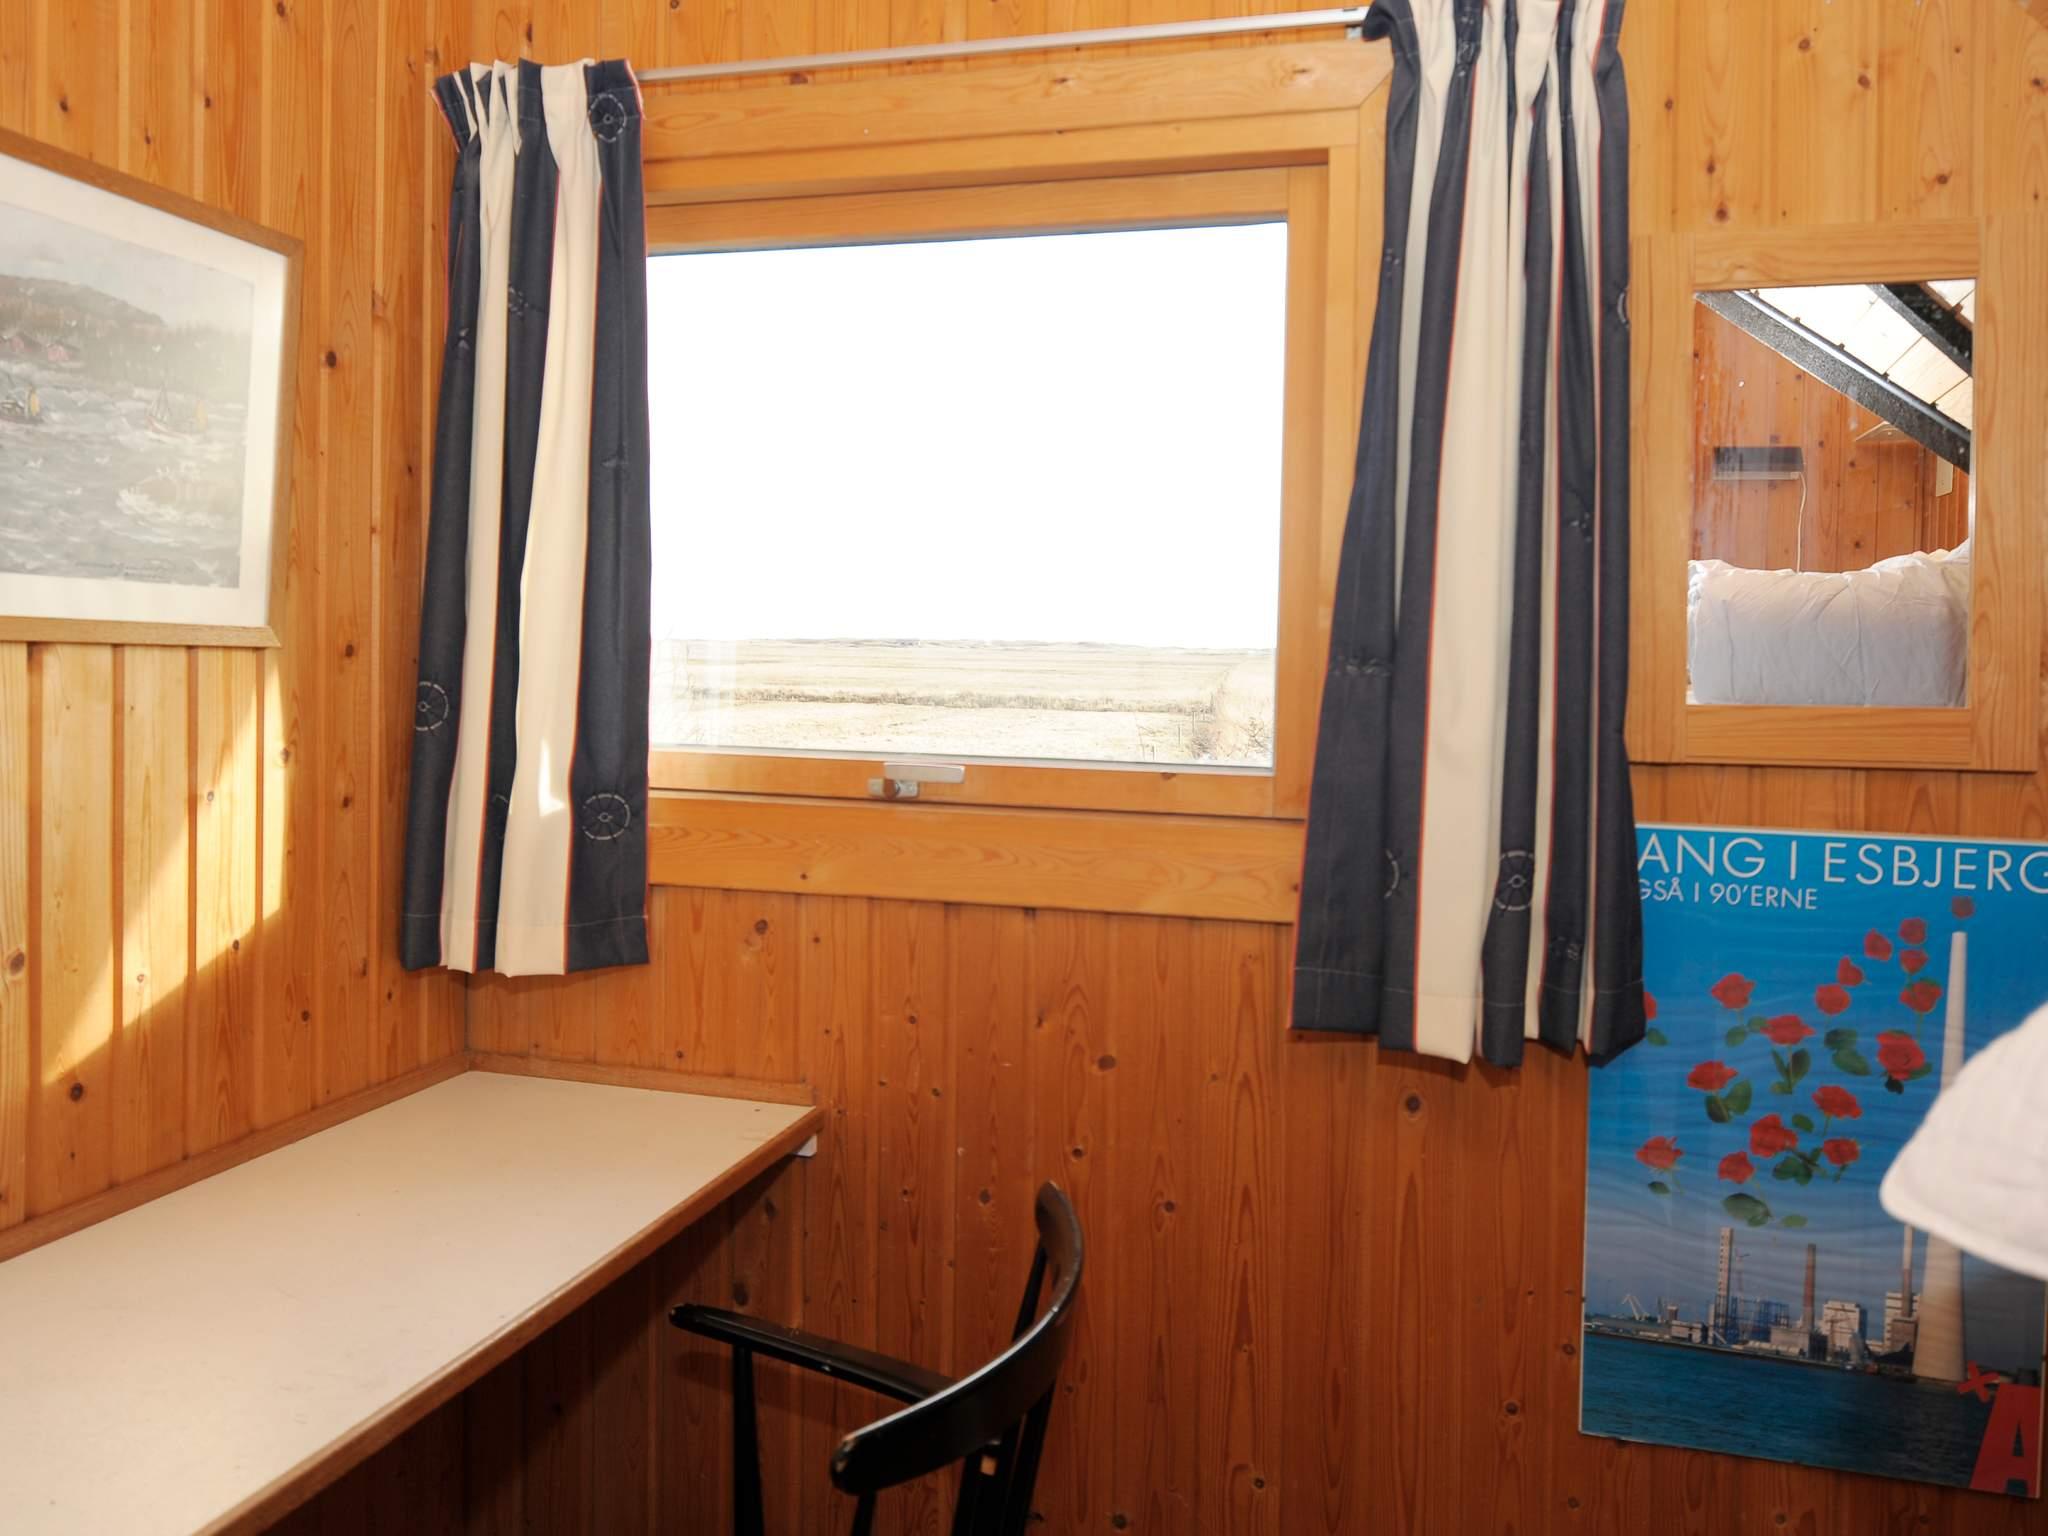 Ferienhaus Blåvand (82266), Blåvand, , Westjütland, Dänemark, Bild 13